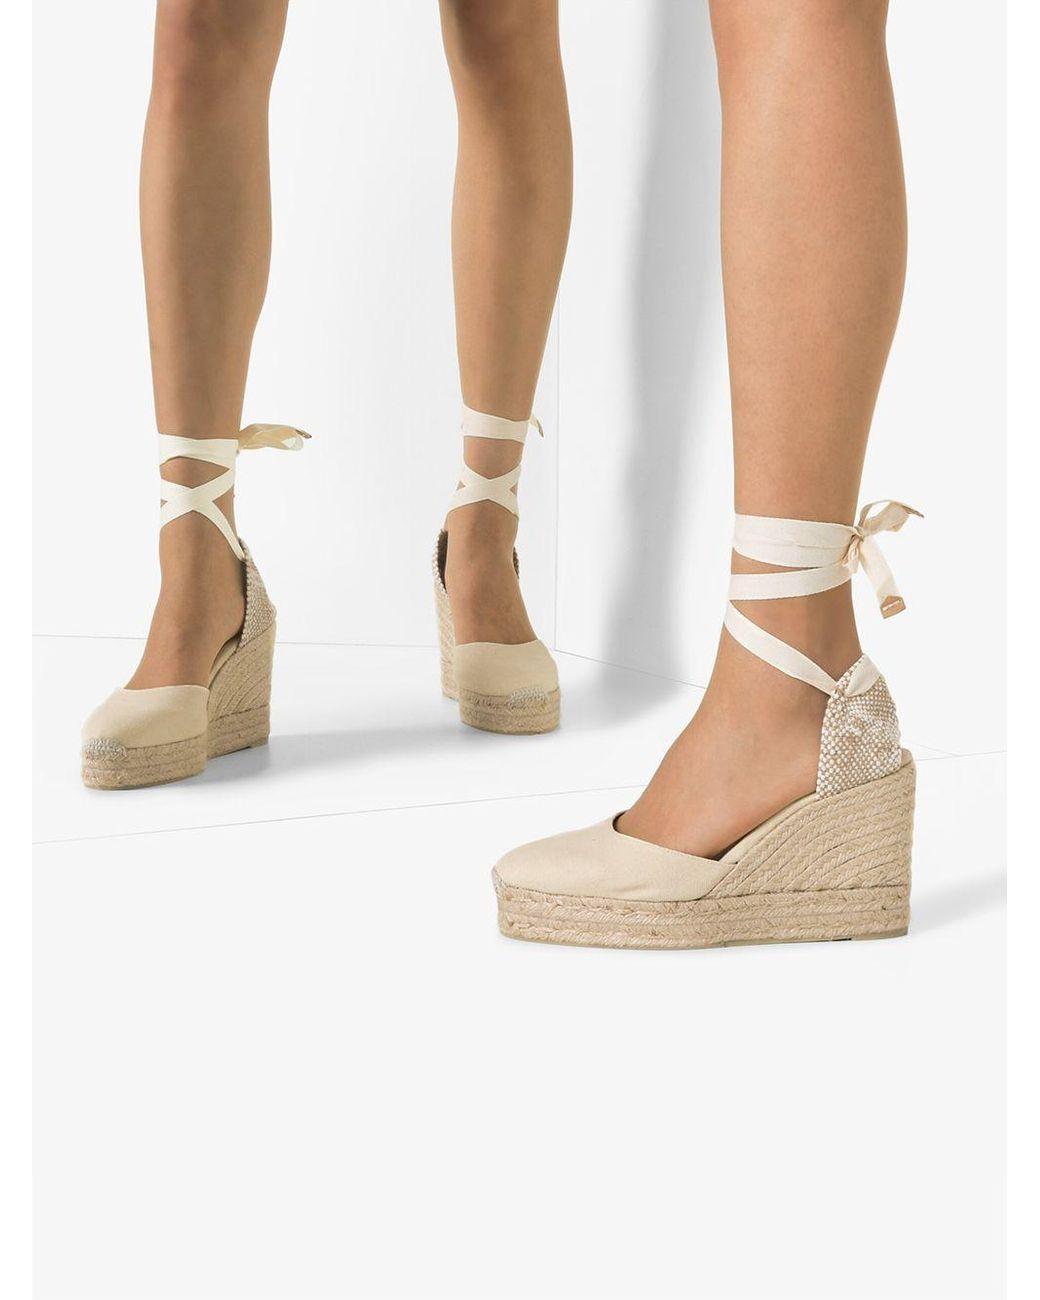 Cream Carina 80 Ankle Tie Wedge Sandals